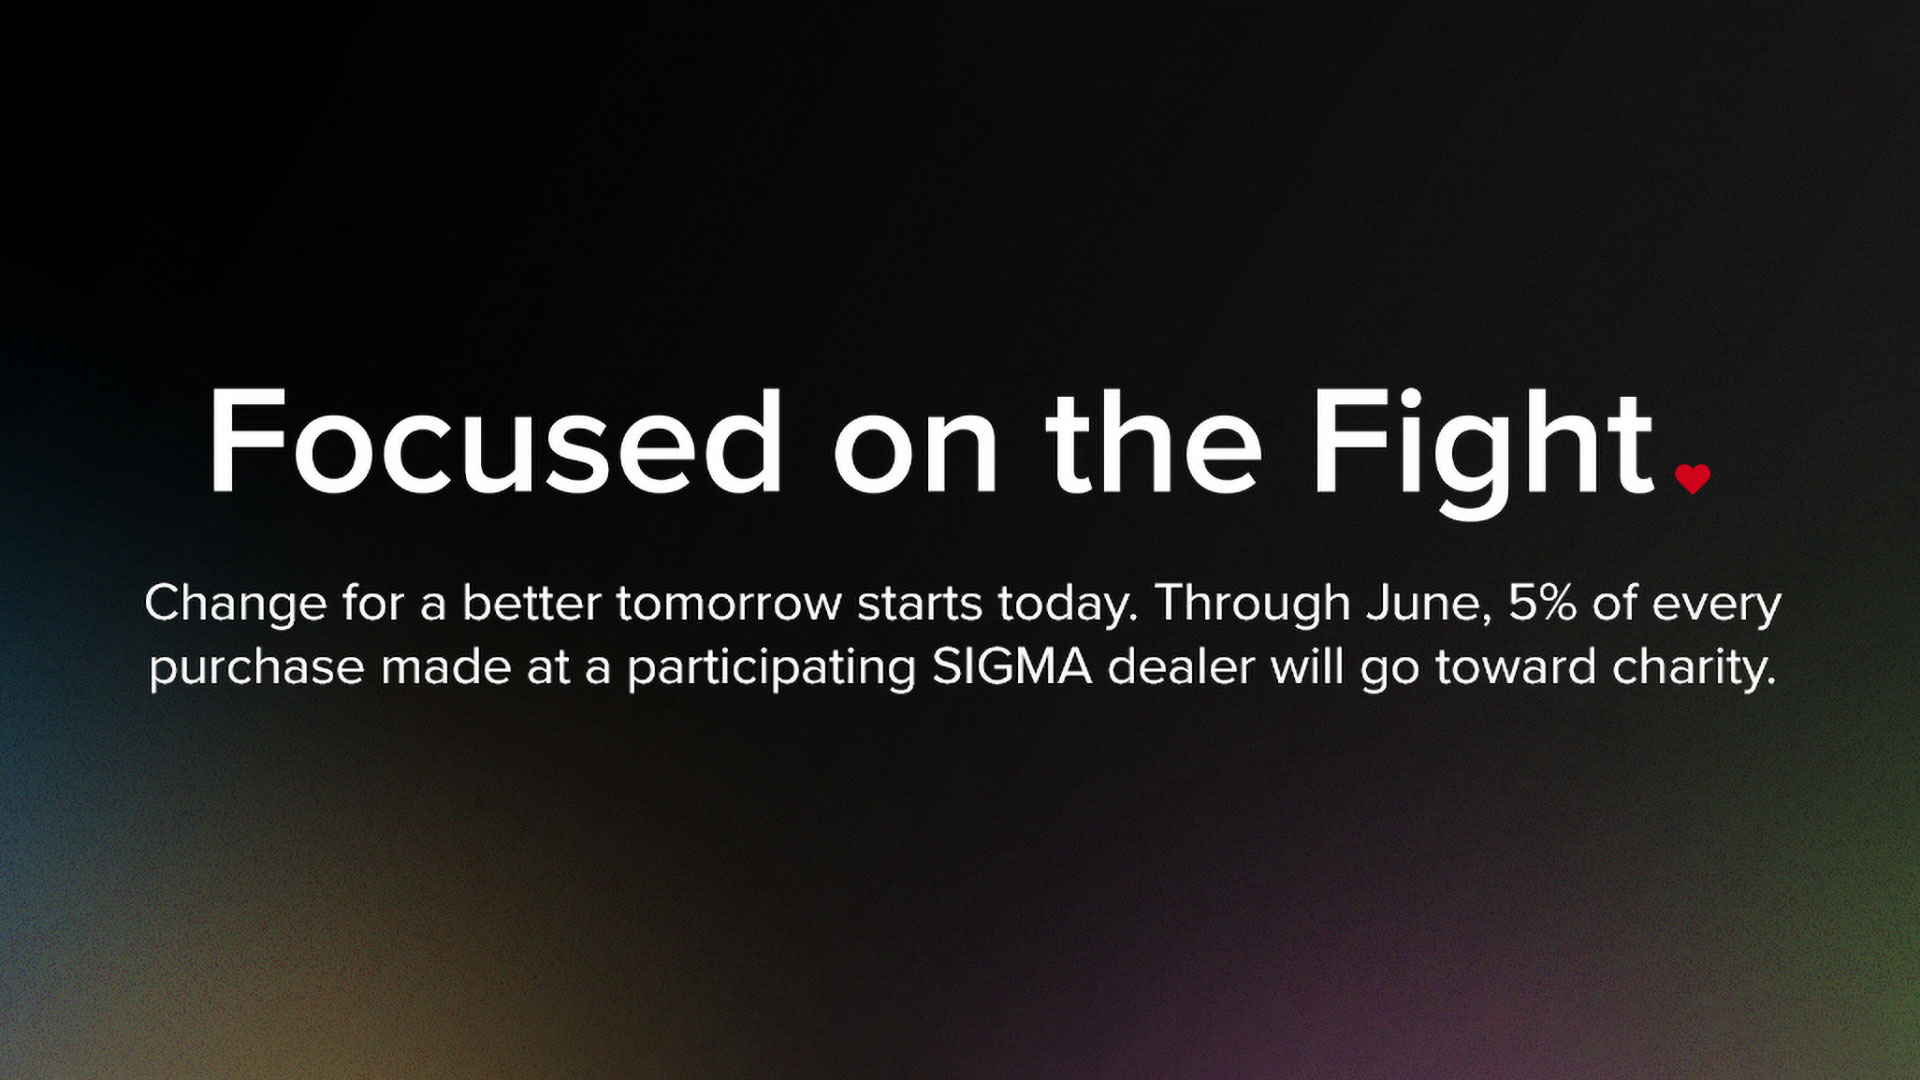 SIGMA-focusonthefight-2021_graphic